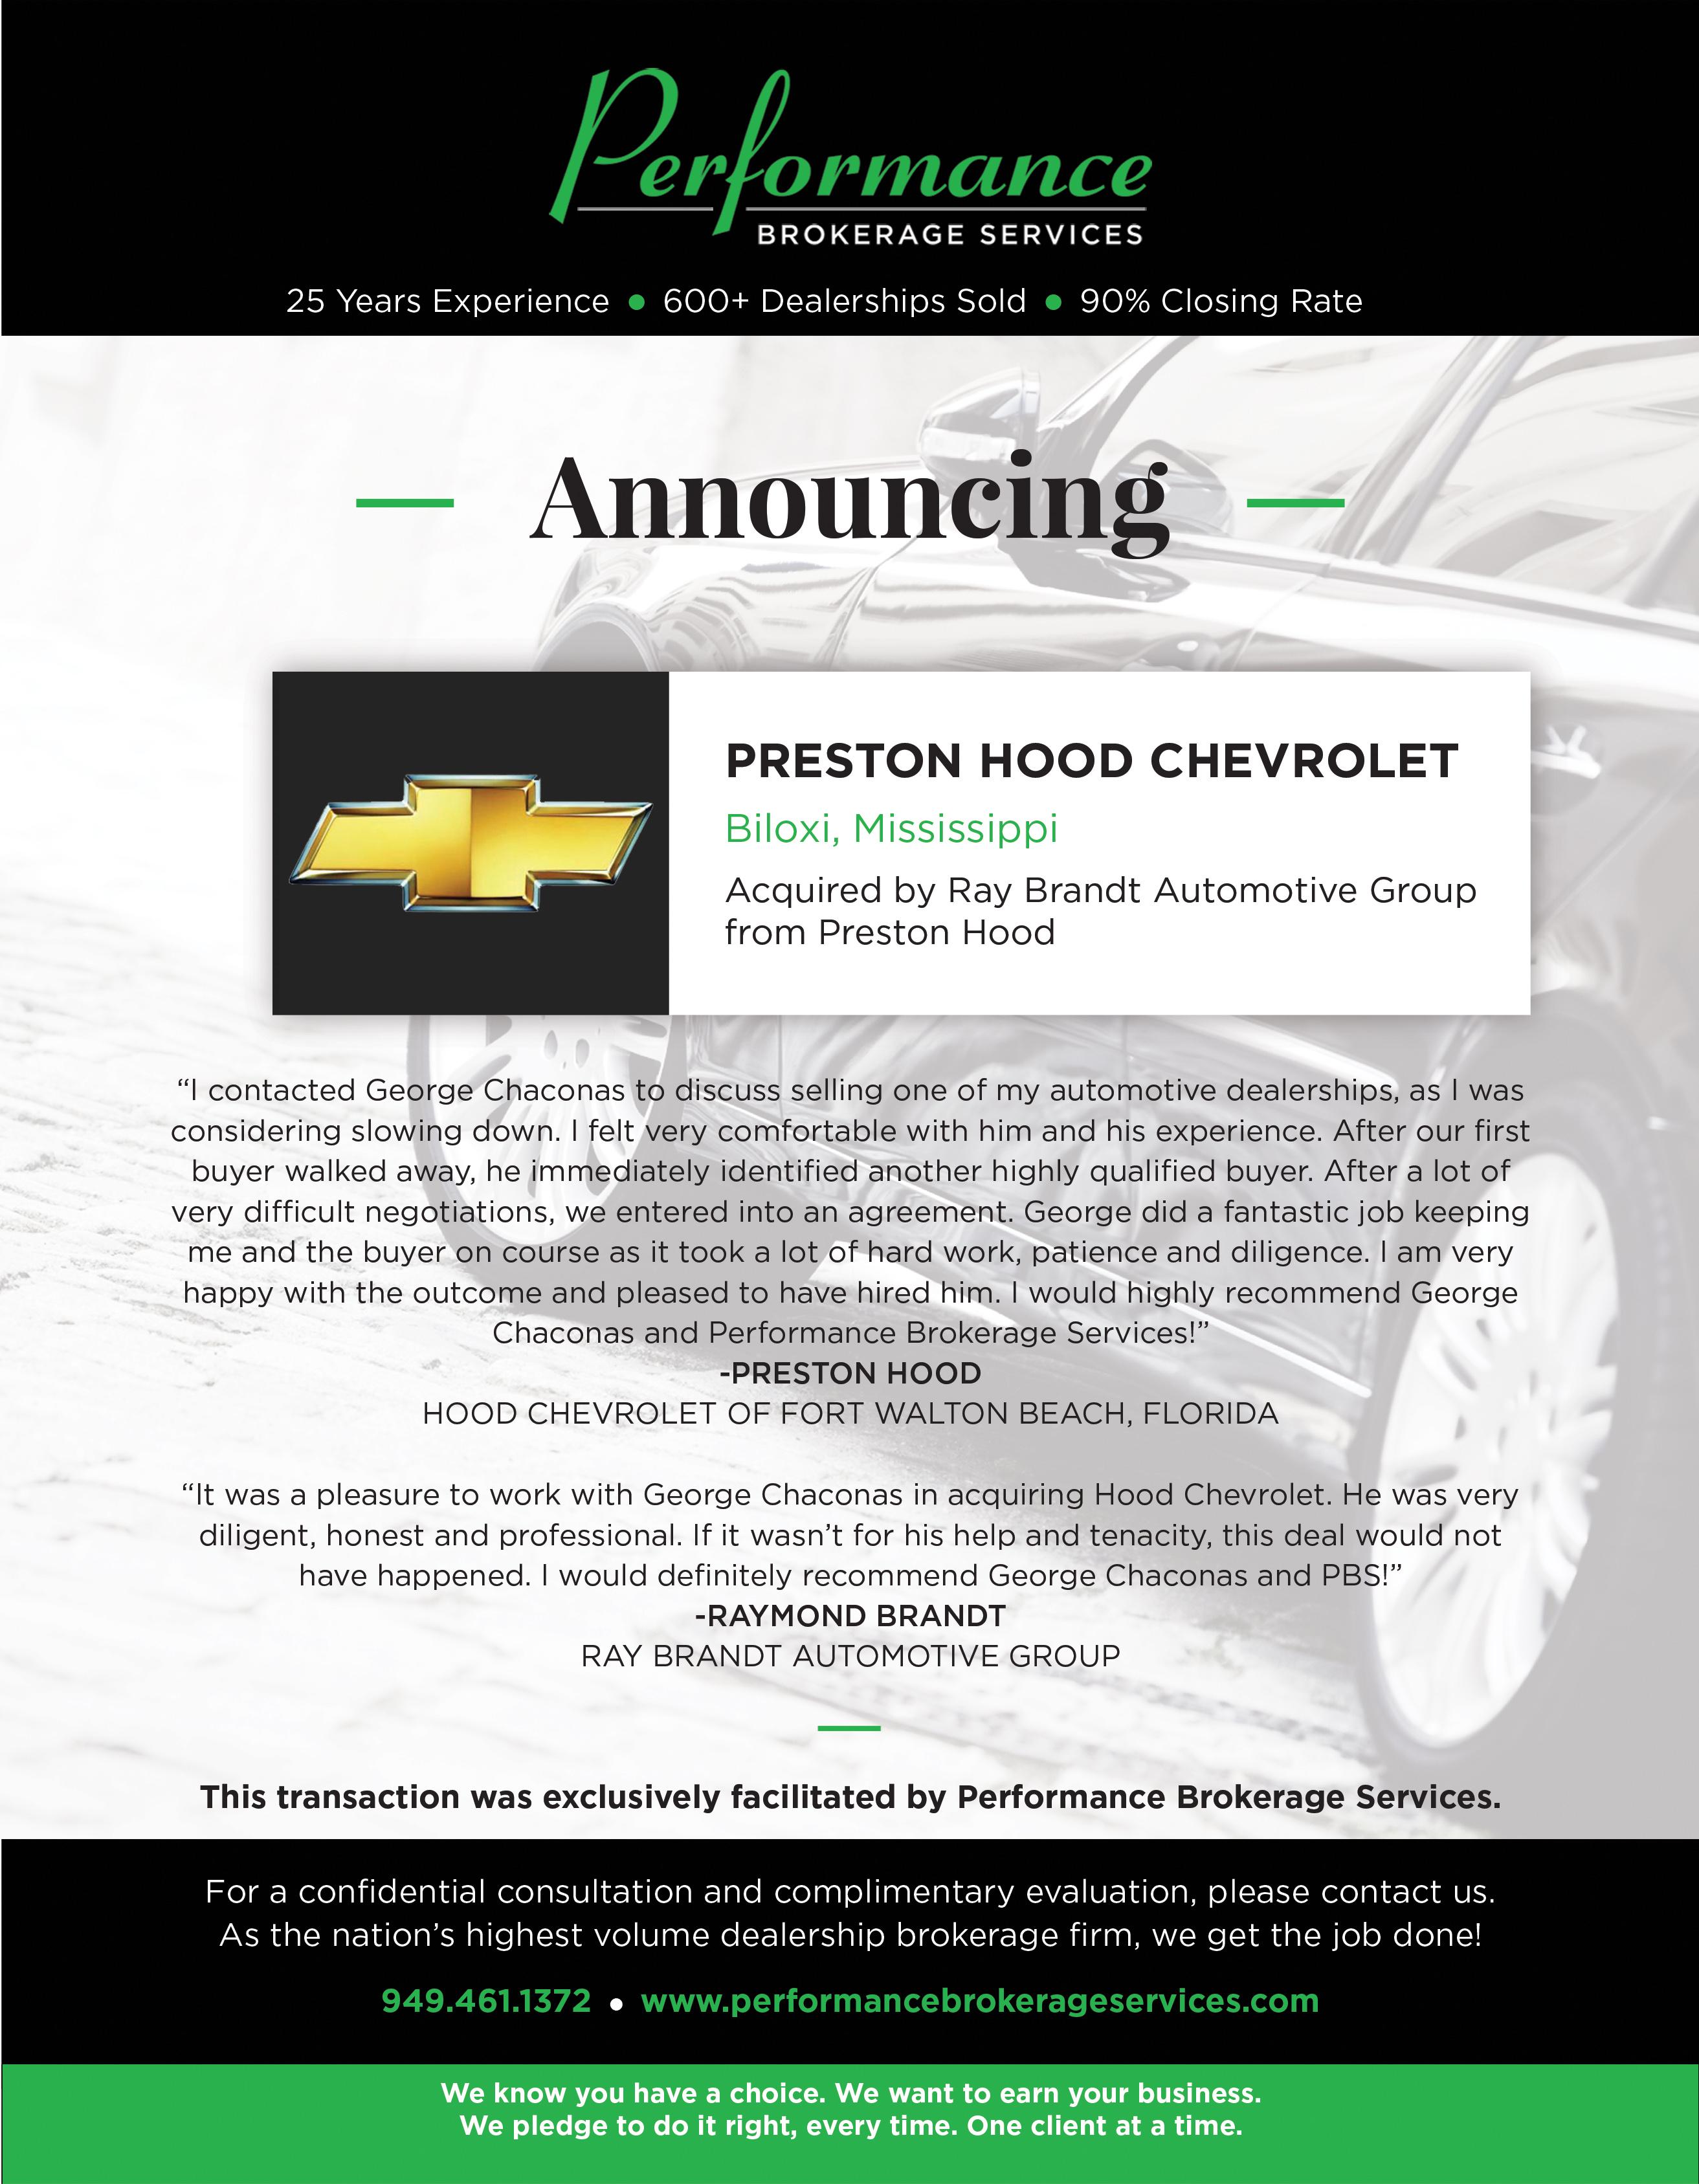 Preston Hood Chevrolet >> Ray Brandt Automotive Group Acquires Preston Hood Chevrolet